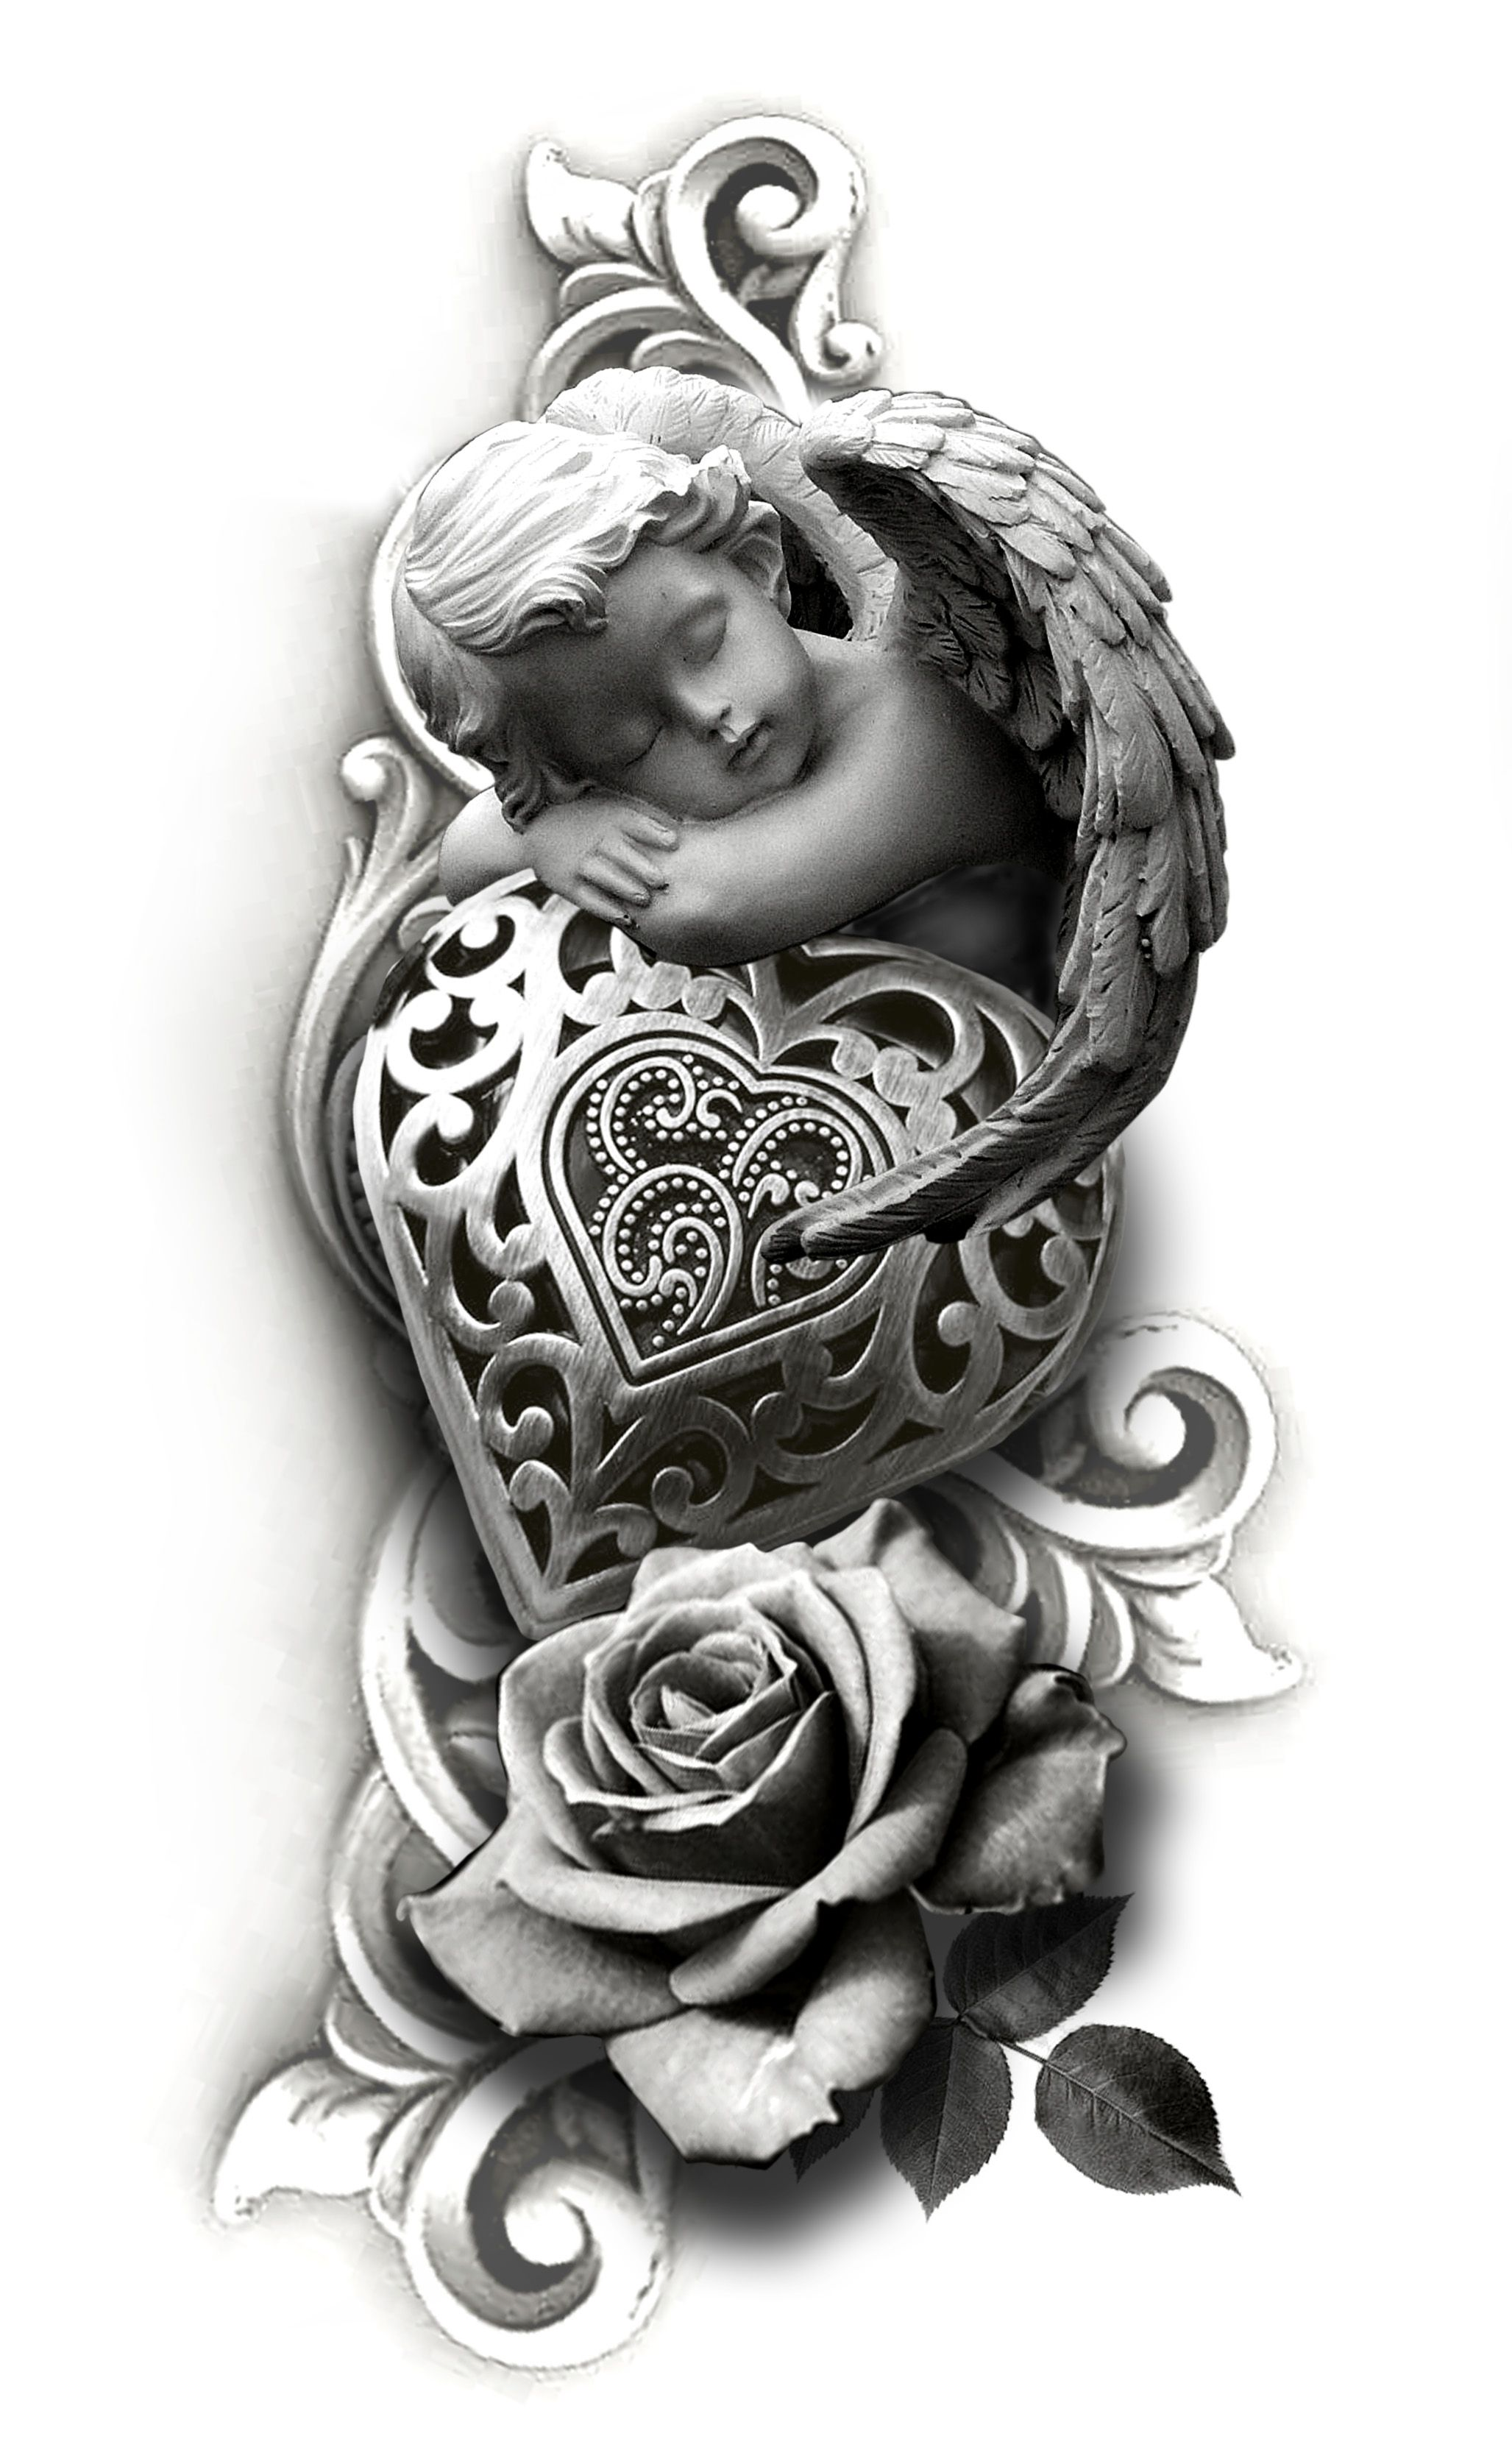 Cherub Heart Rose Tattoo Design In 2020 Dark Tattoo Tattoo Design Drawings Tattoo Sleeve Designs